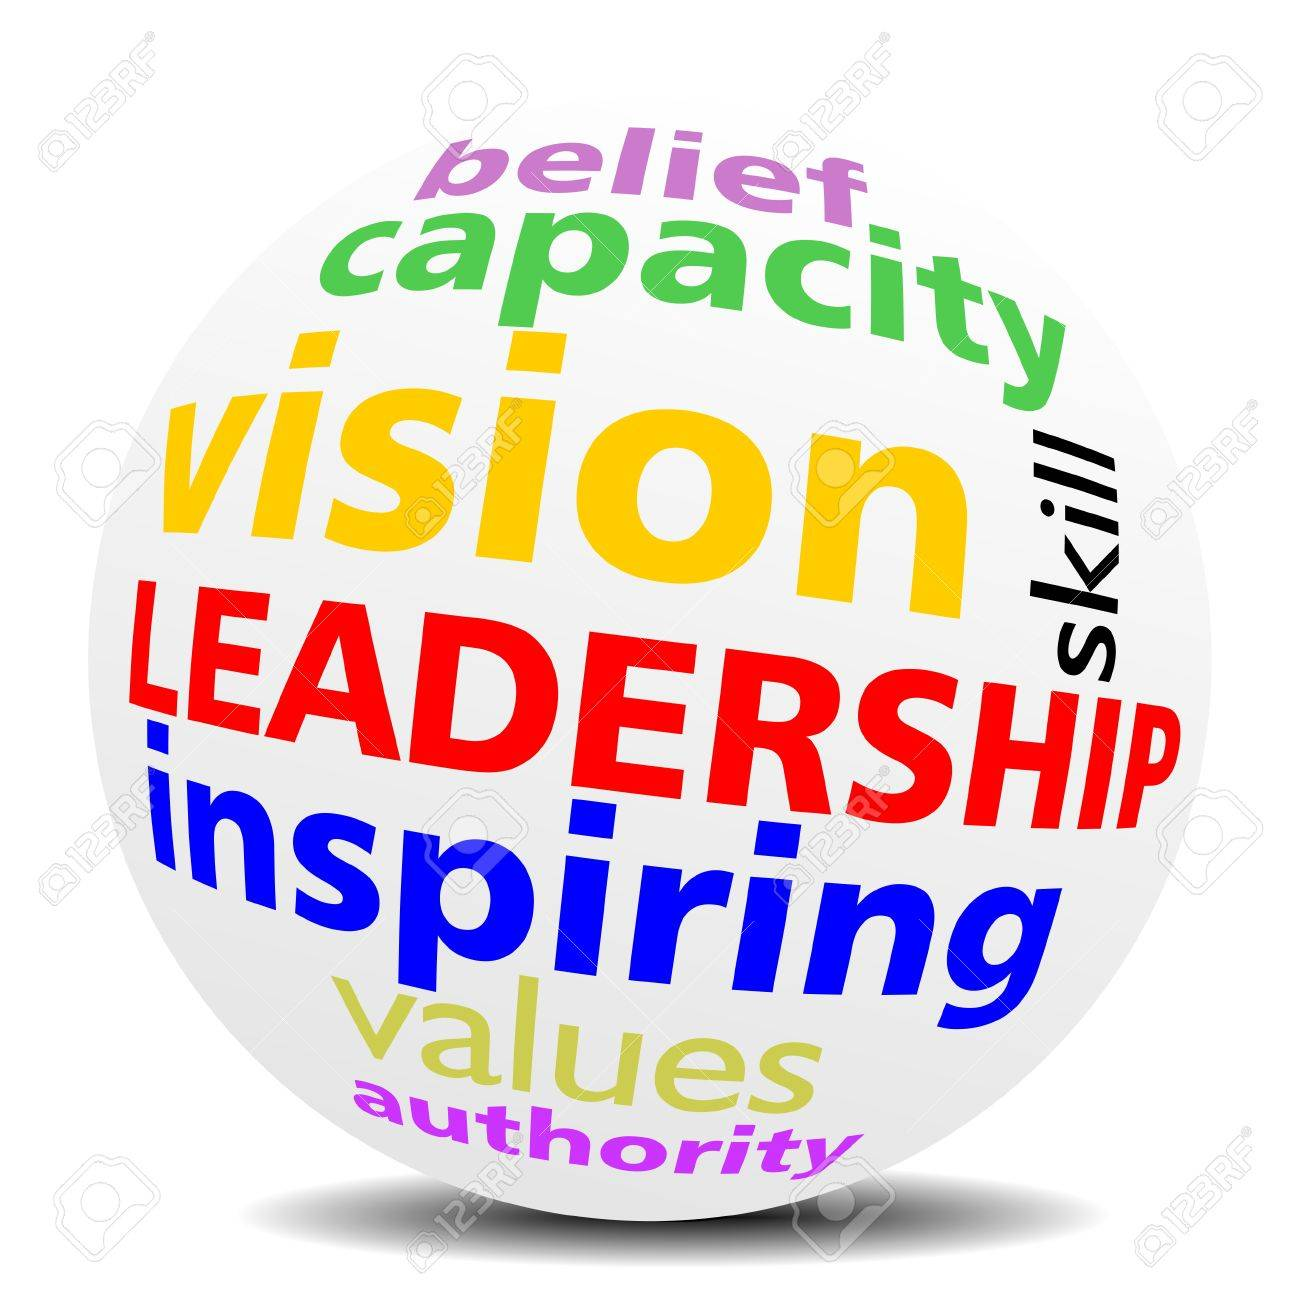 Student Leadership Clipart.